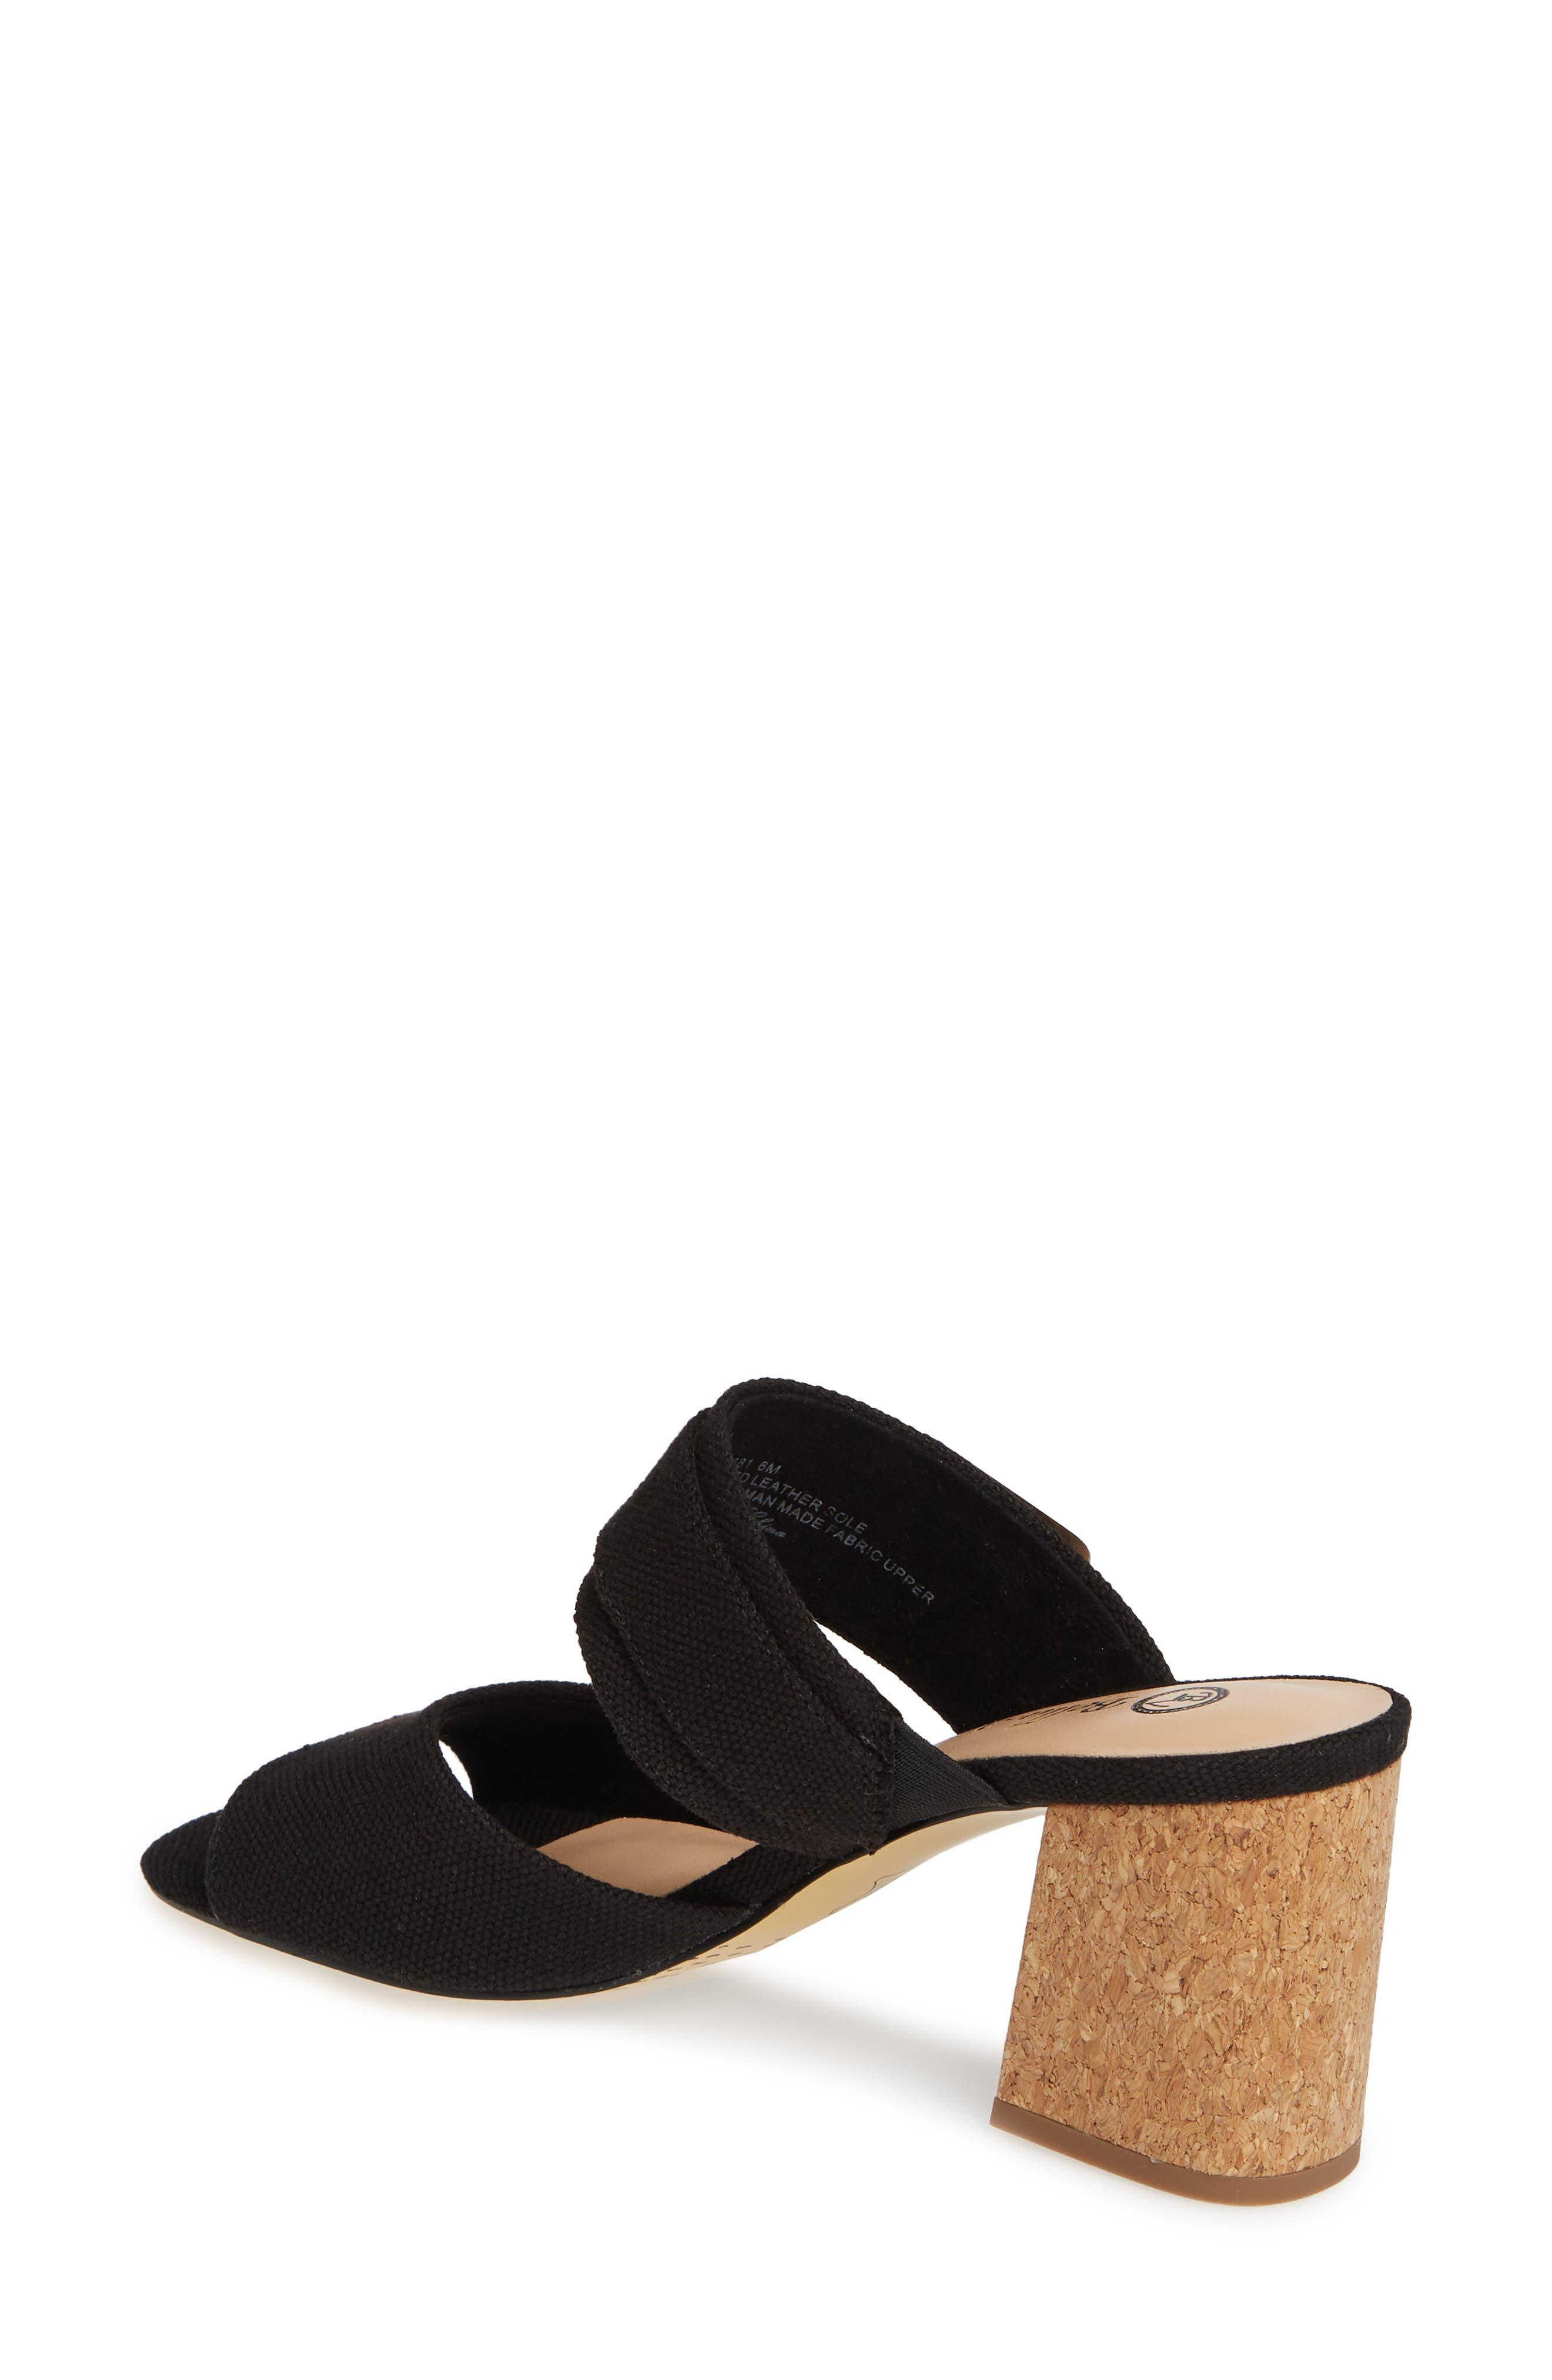 BELLA VITA, Tory II Buckle Slide Sandal, Alternate thumbnail 2, color, BLACK LINEN FABRIC